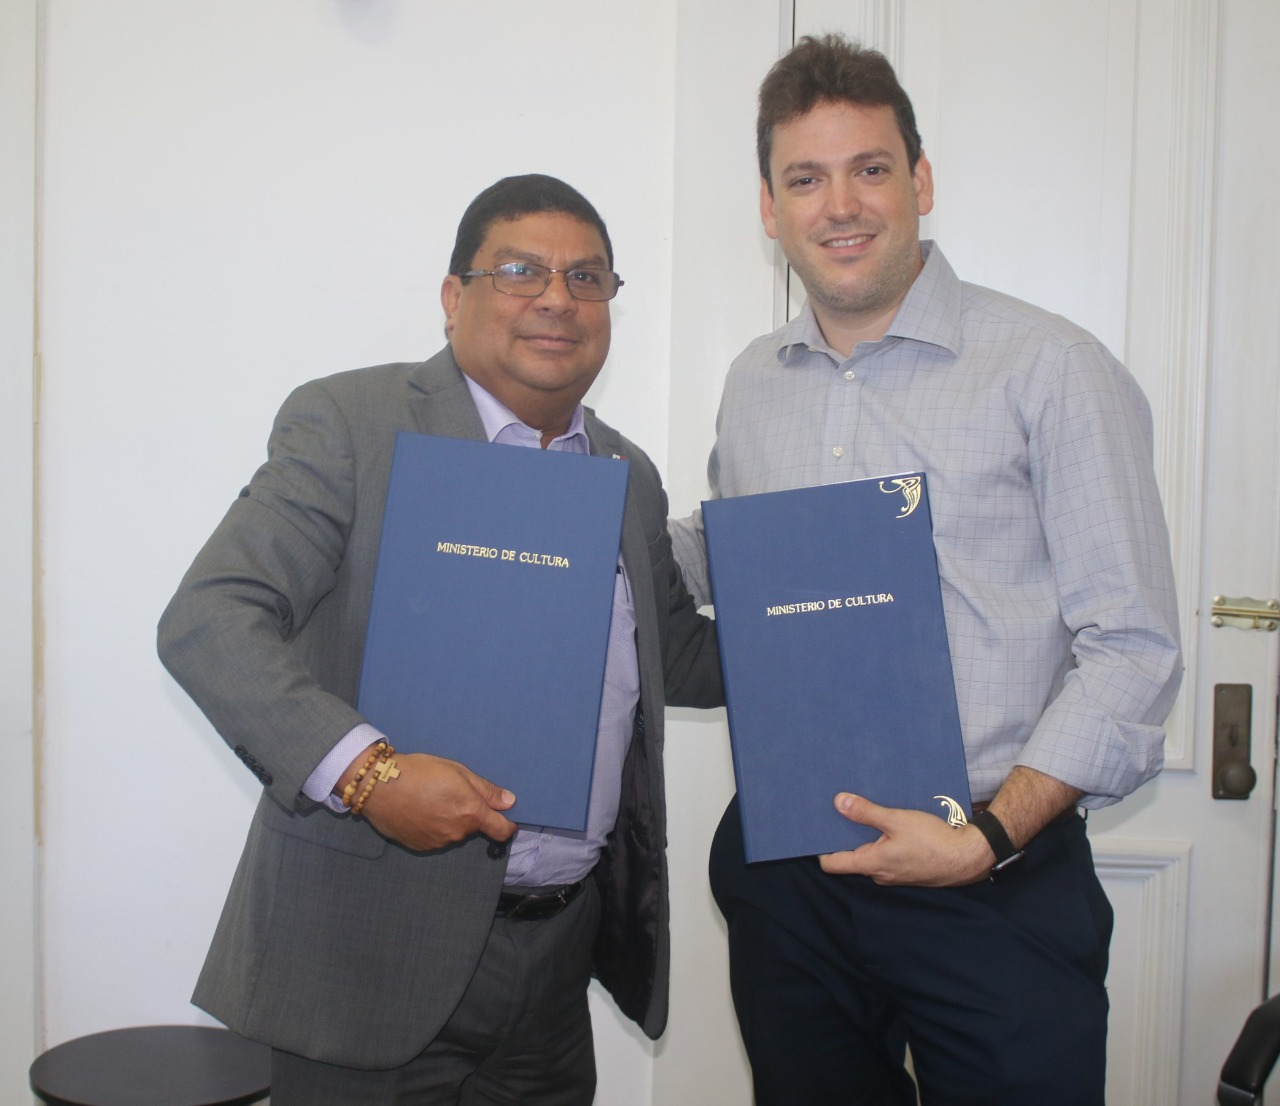 Firman acuerdo cultural para salvaguardar la tradicional Junta de Embarra